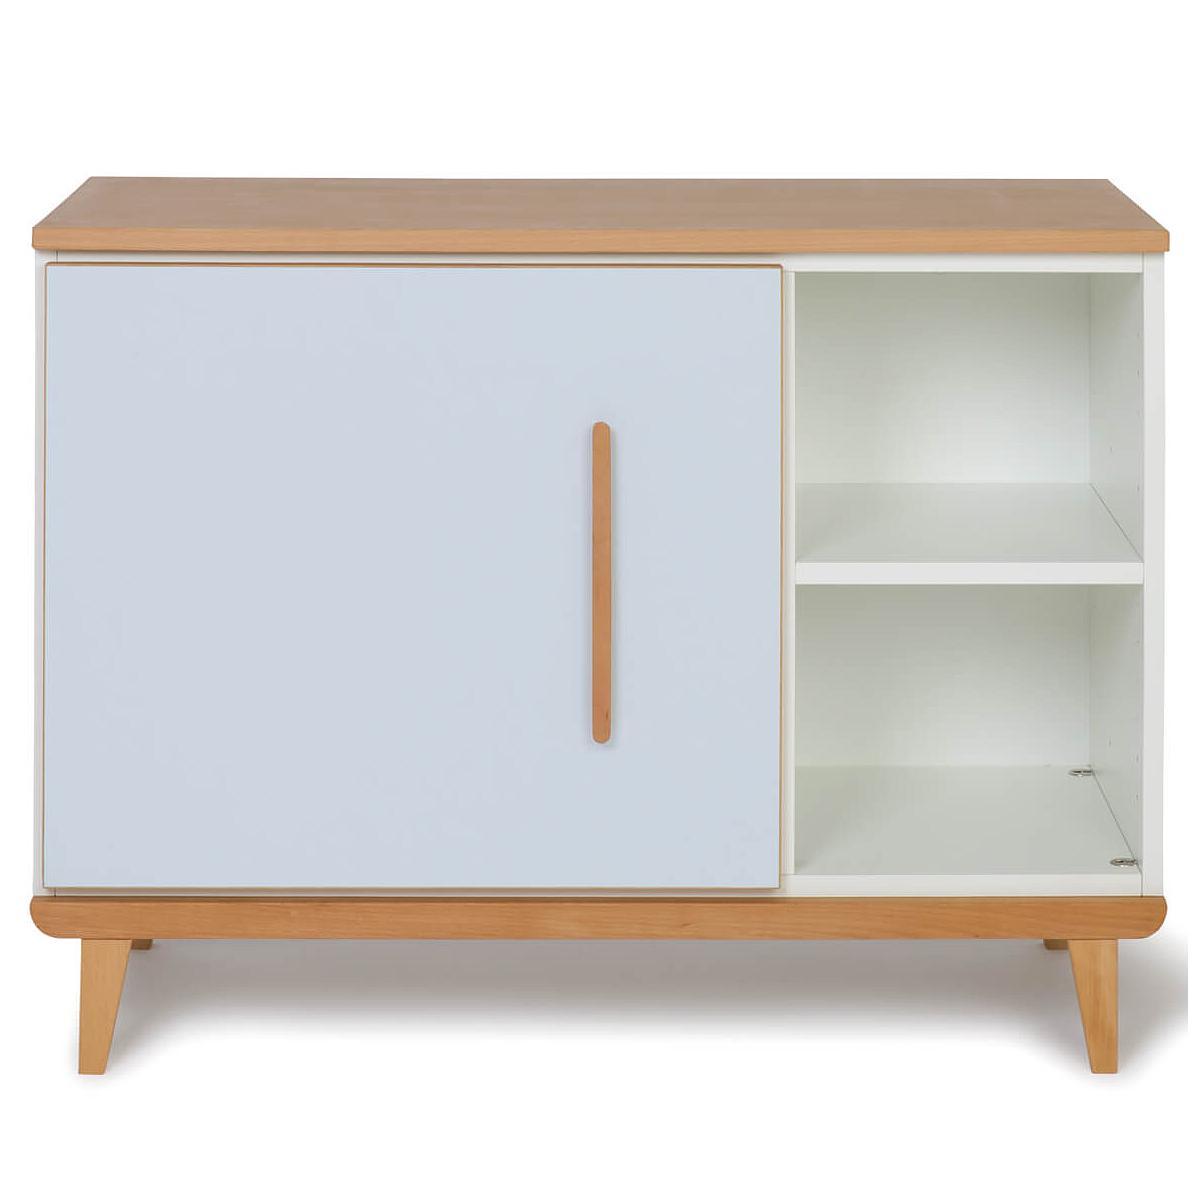 Mueble pequeño 1 puerta NADO By A.K. sky blue